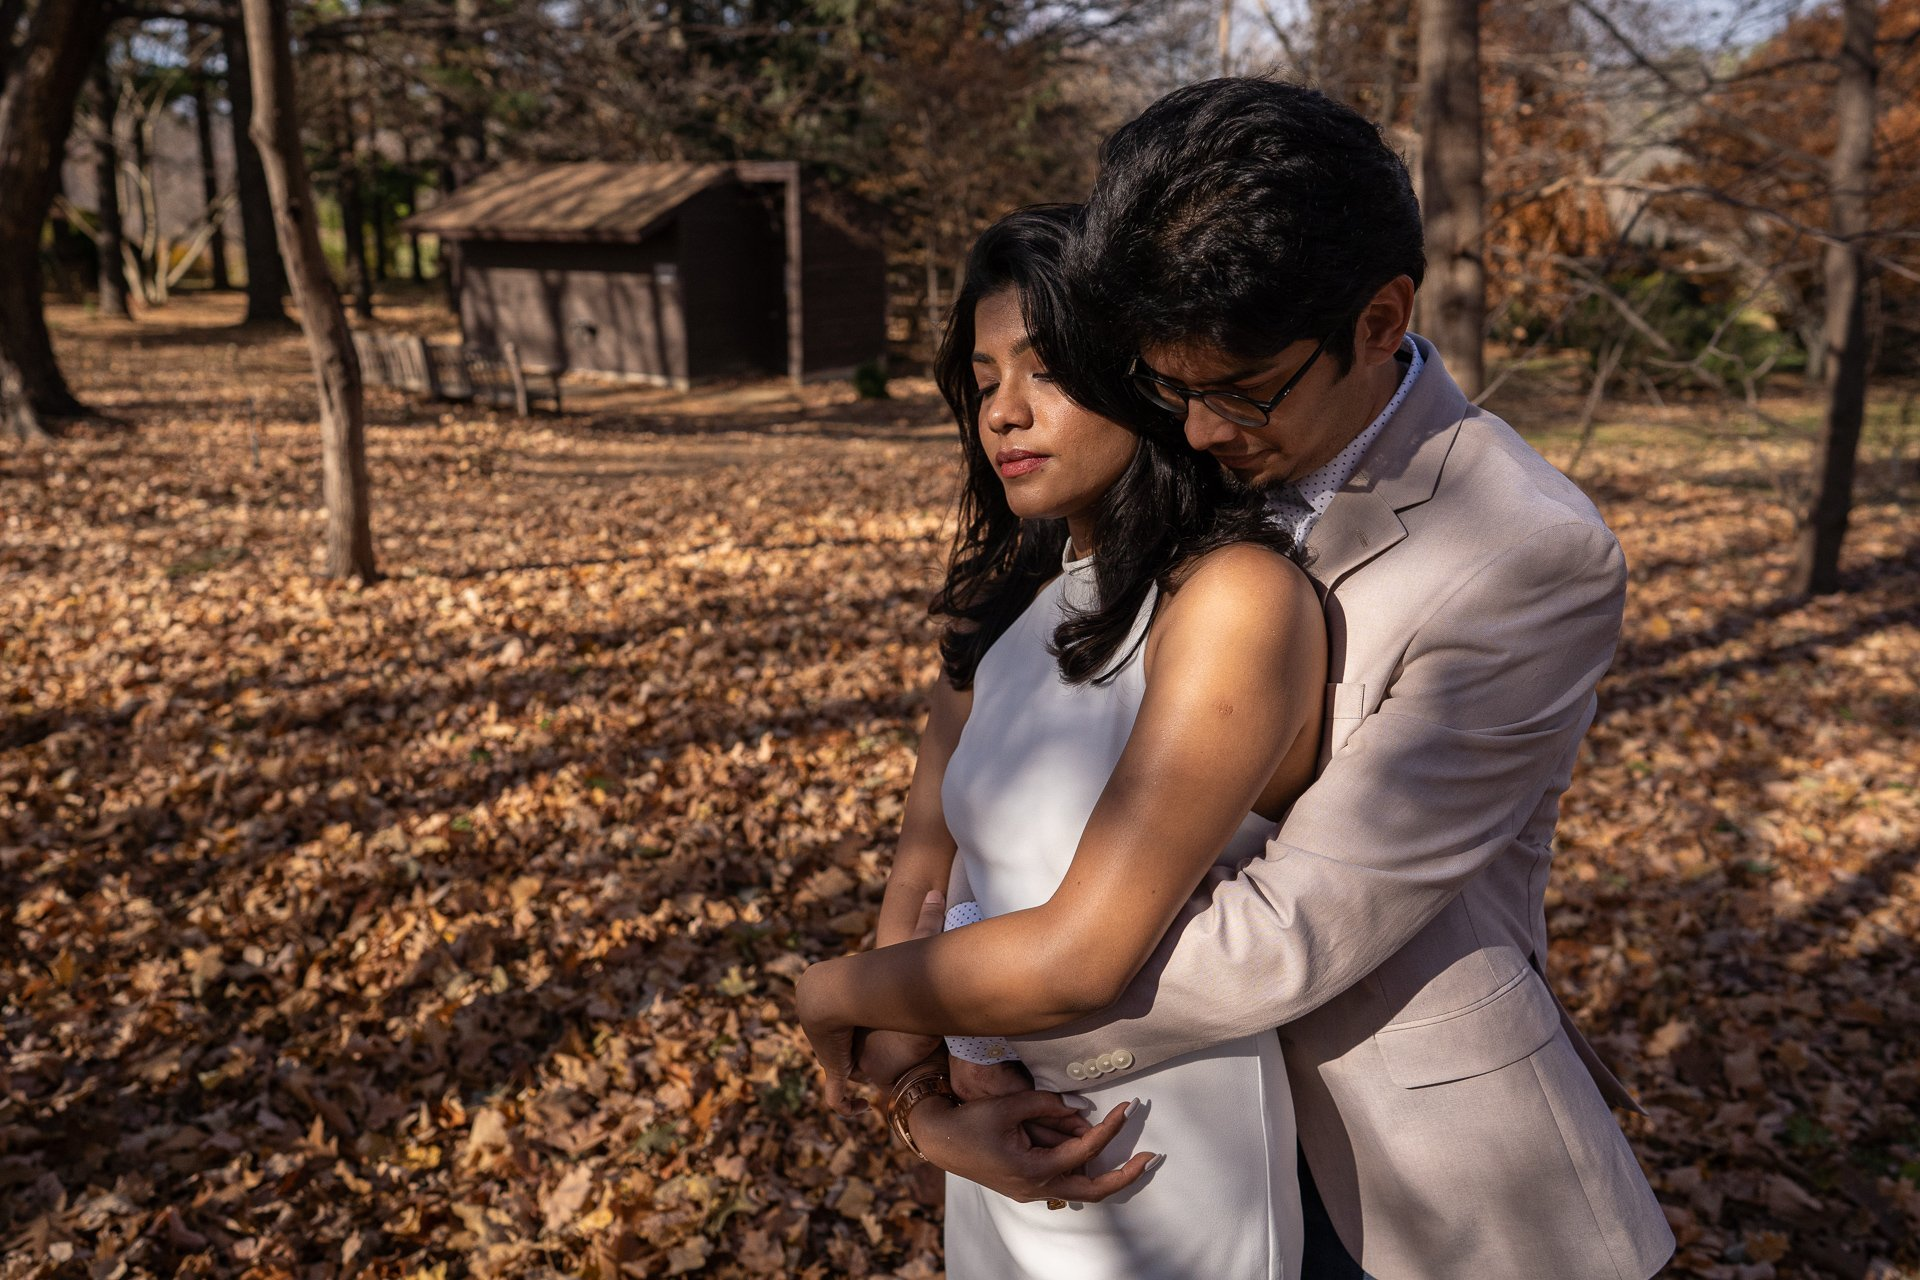 man hugging women engagement photography